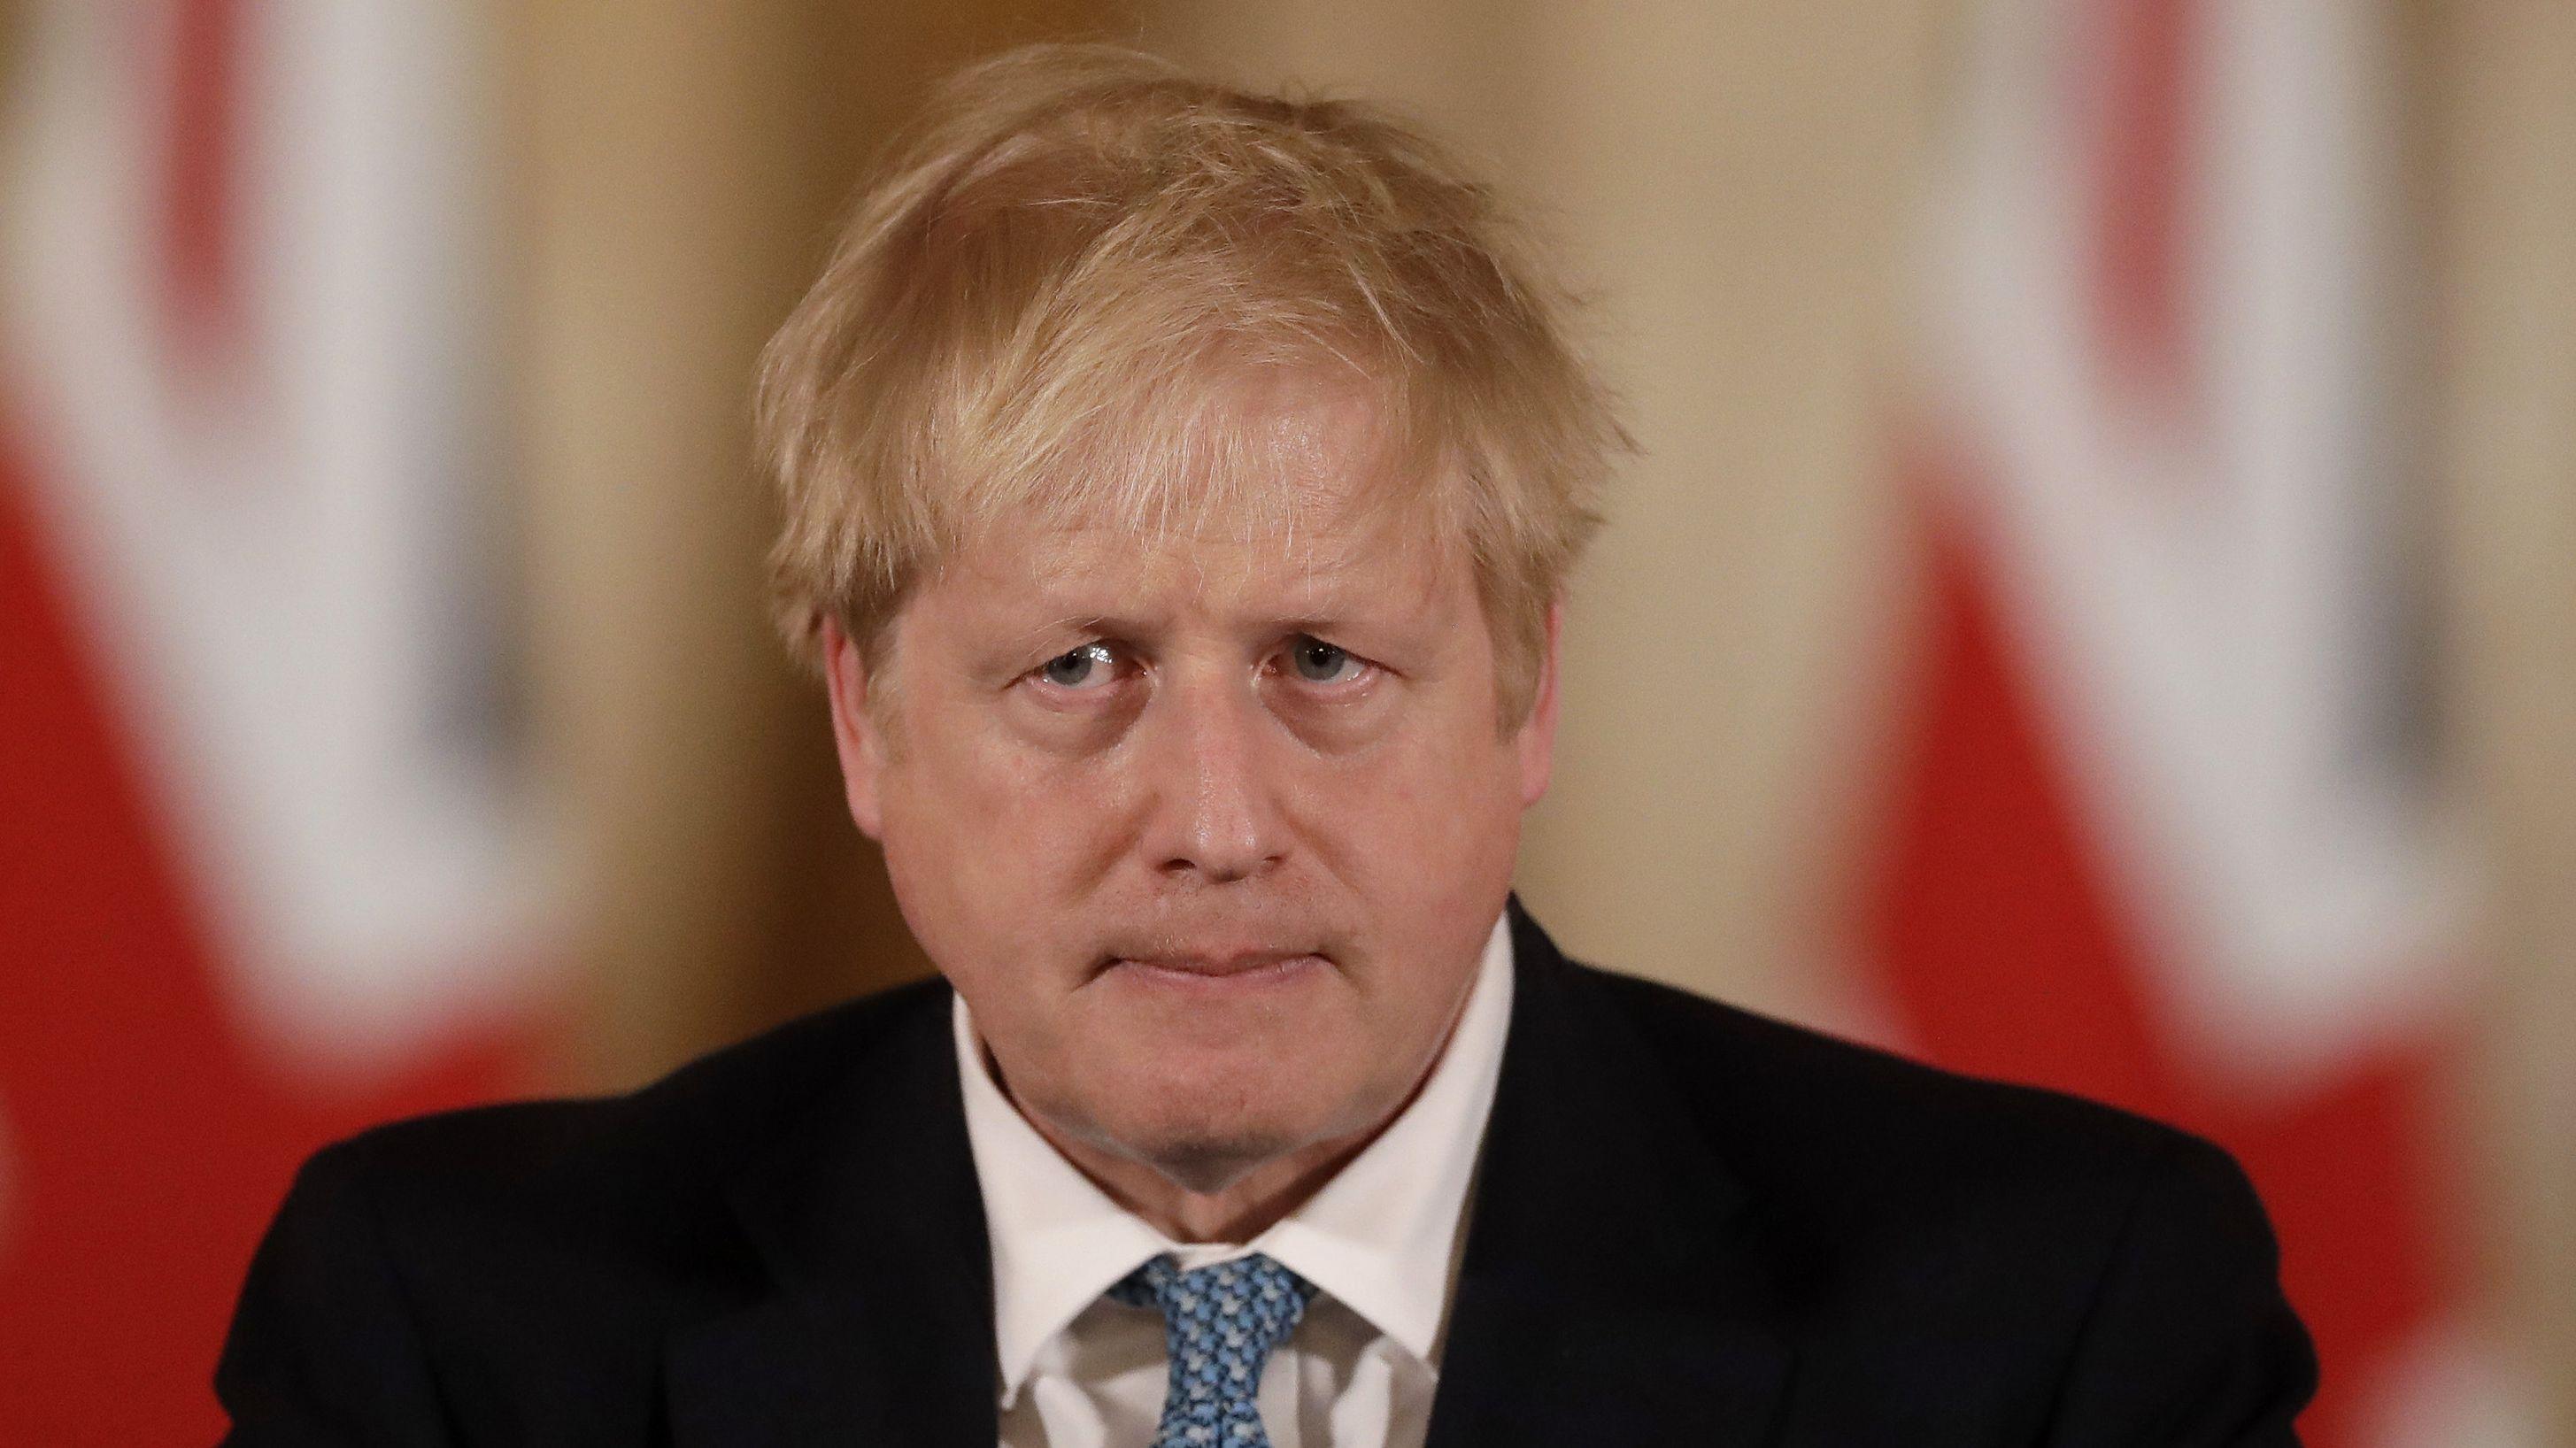 Premier Johnson